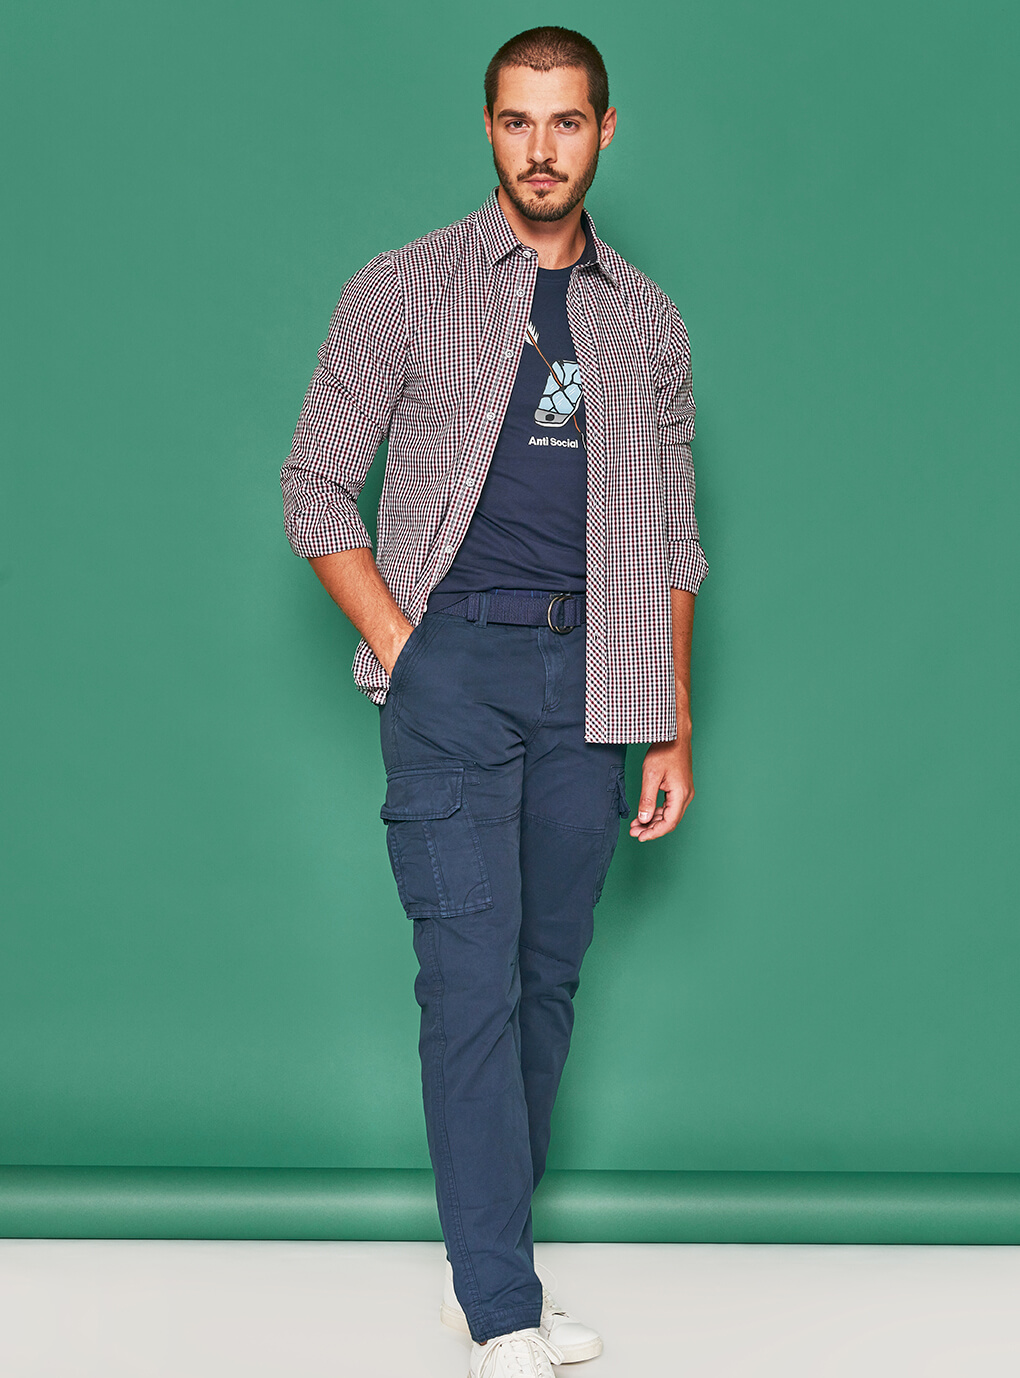 Jack & Jones majica antisocial  109 kn Marx košulja 239 kn  Marx hlače 399 kn